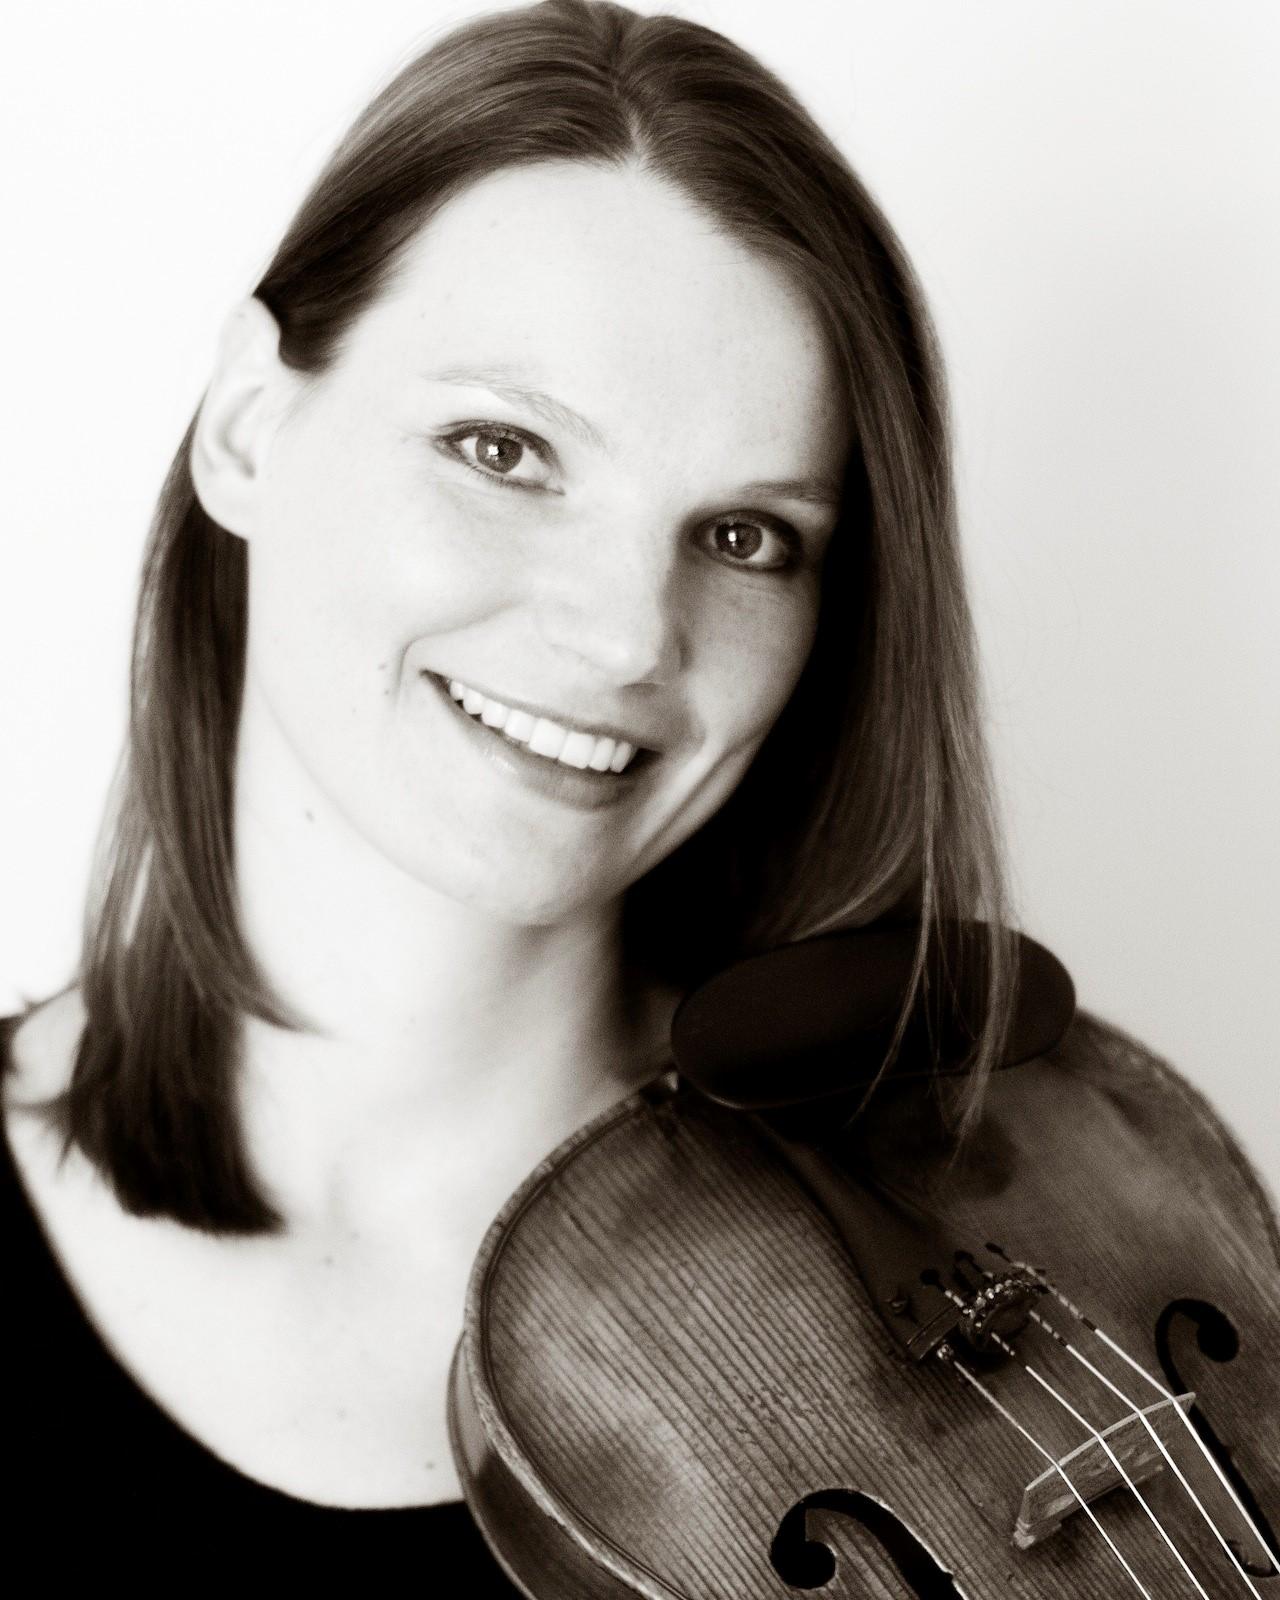 katrin meidell, anderson symphony, orchestra, york hall, aso, viola